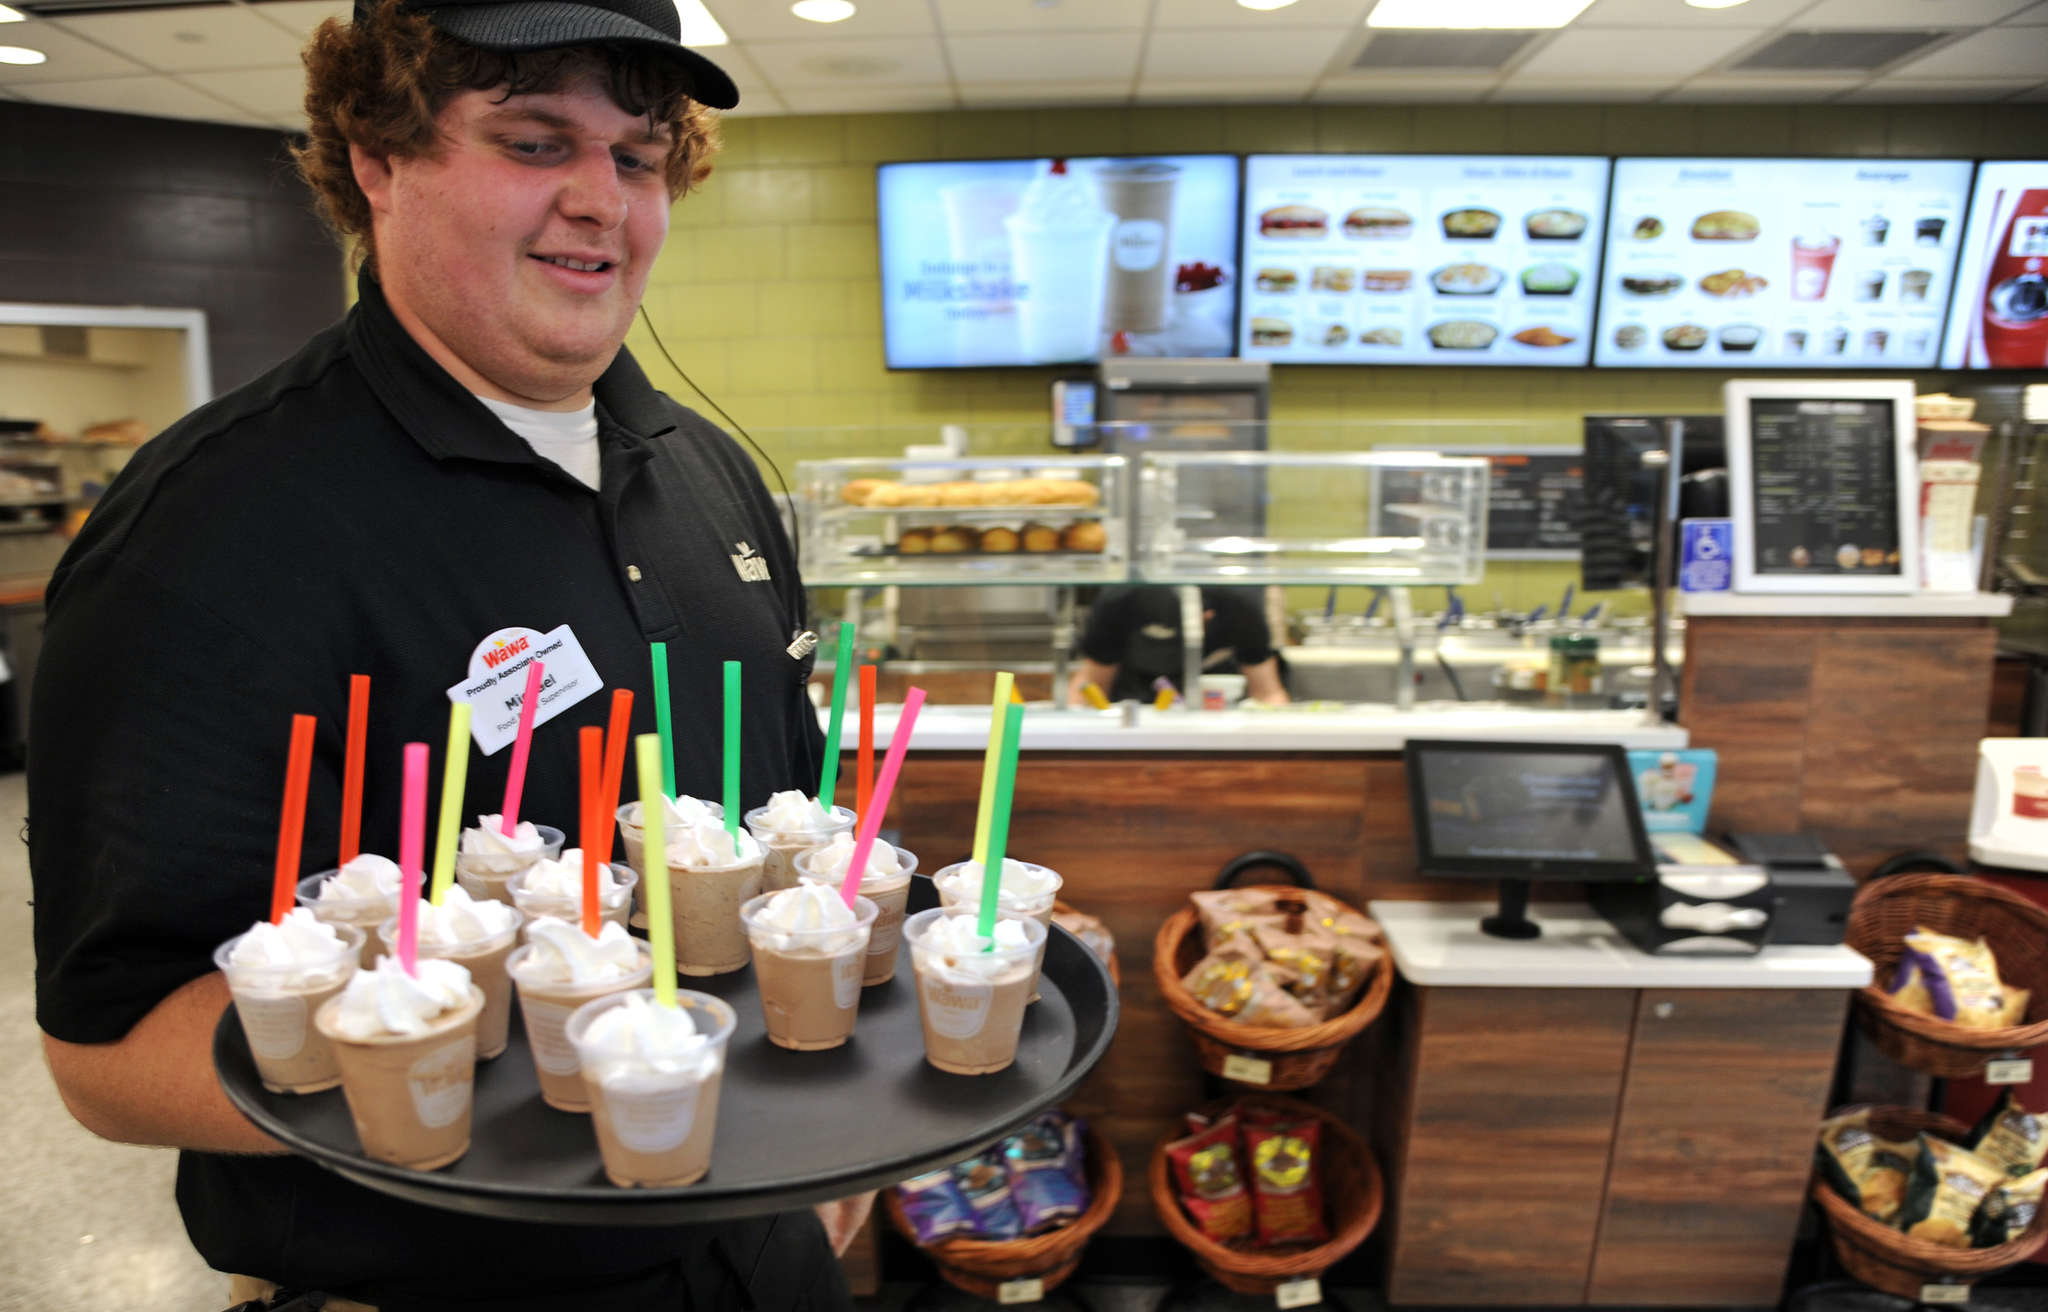 Food and beverage supervisor Mike Eckerle offers customers free milkshake samples in a remodeled store in Conshohocken.